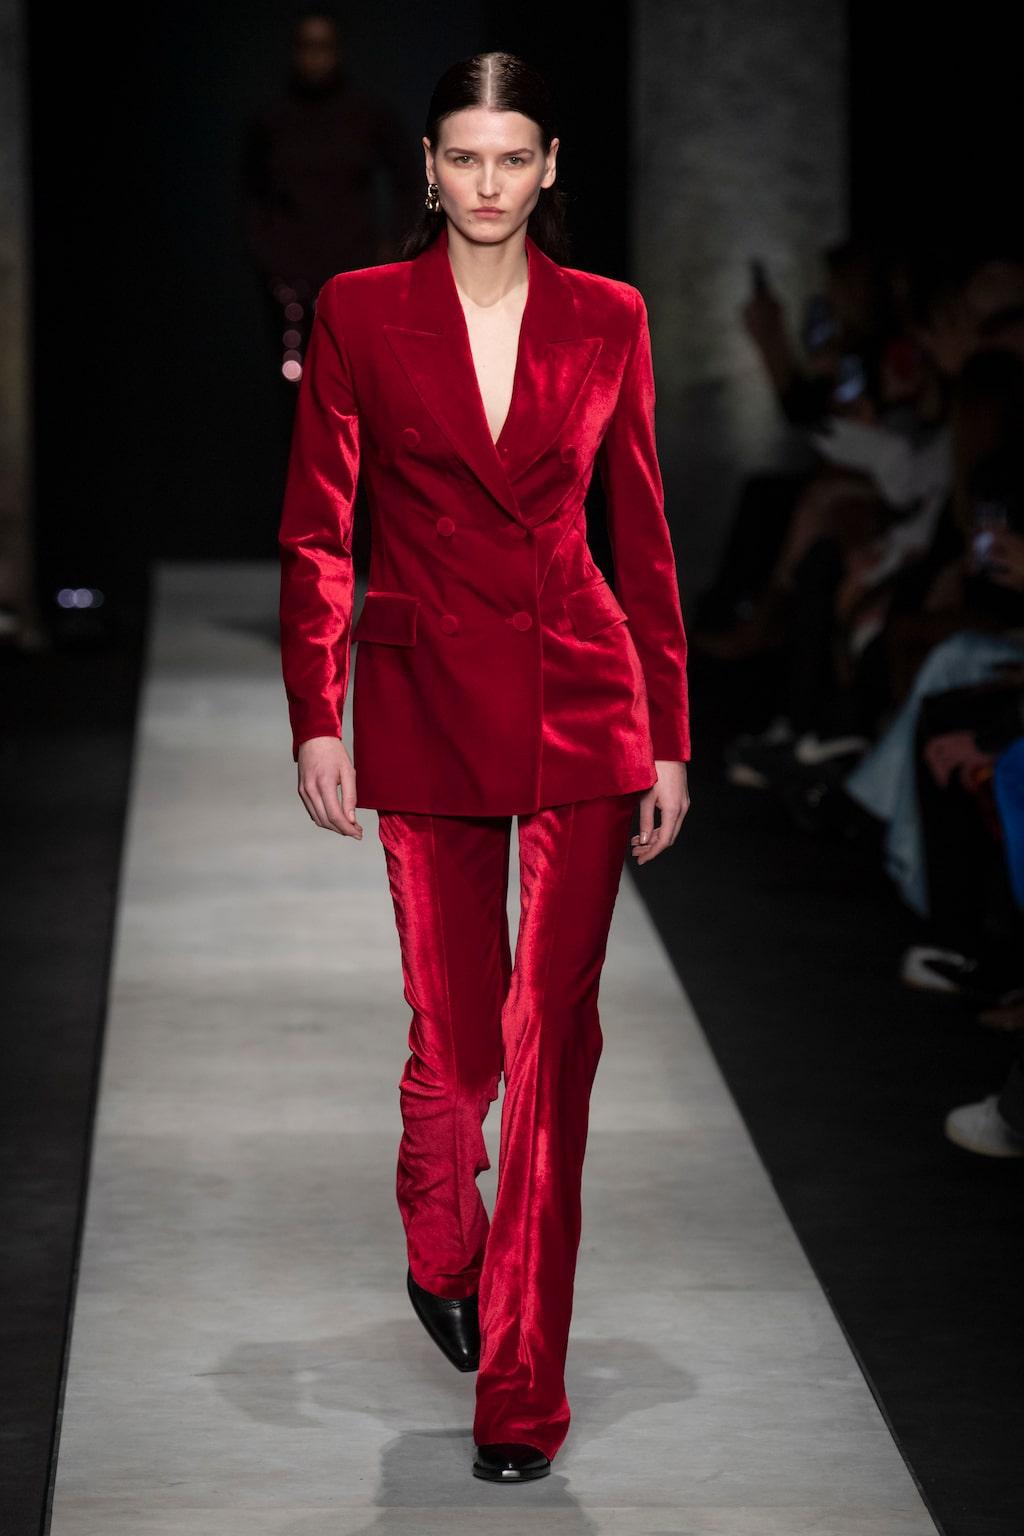 Höstmode 2020: rött hos Ermanno Scervino AW20.